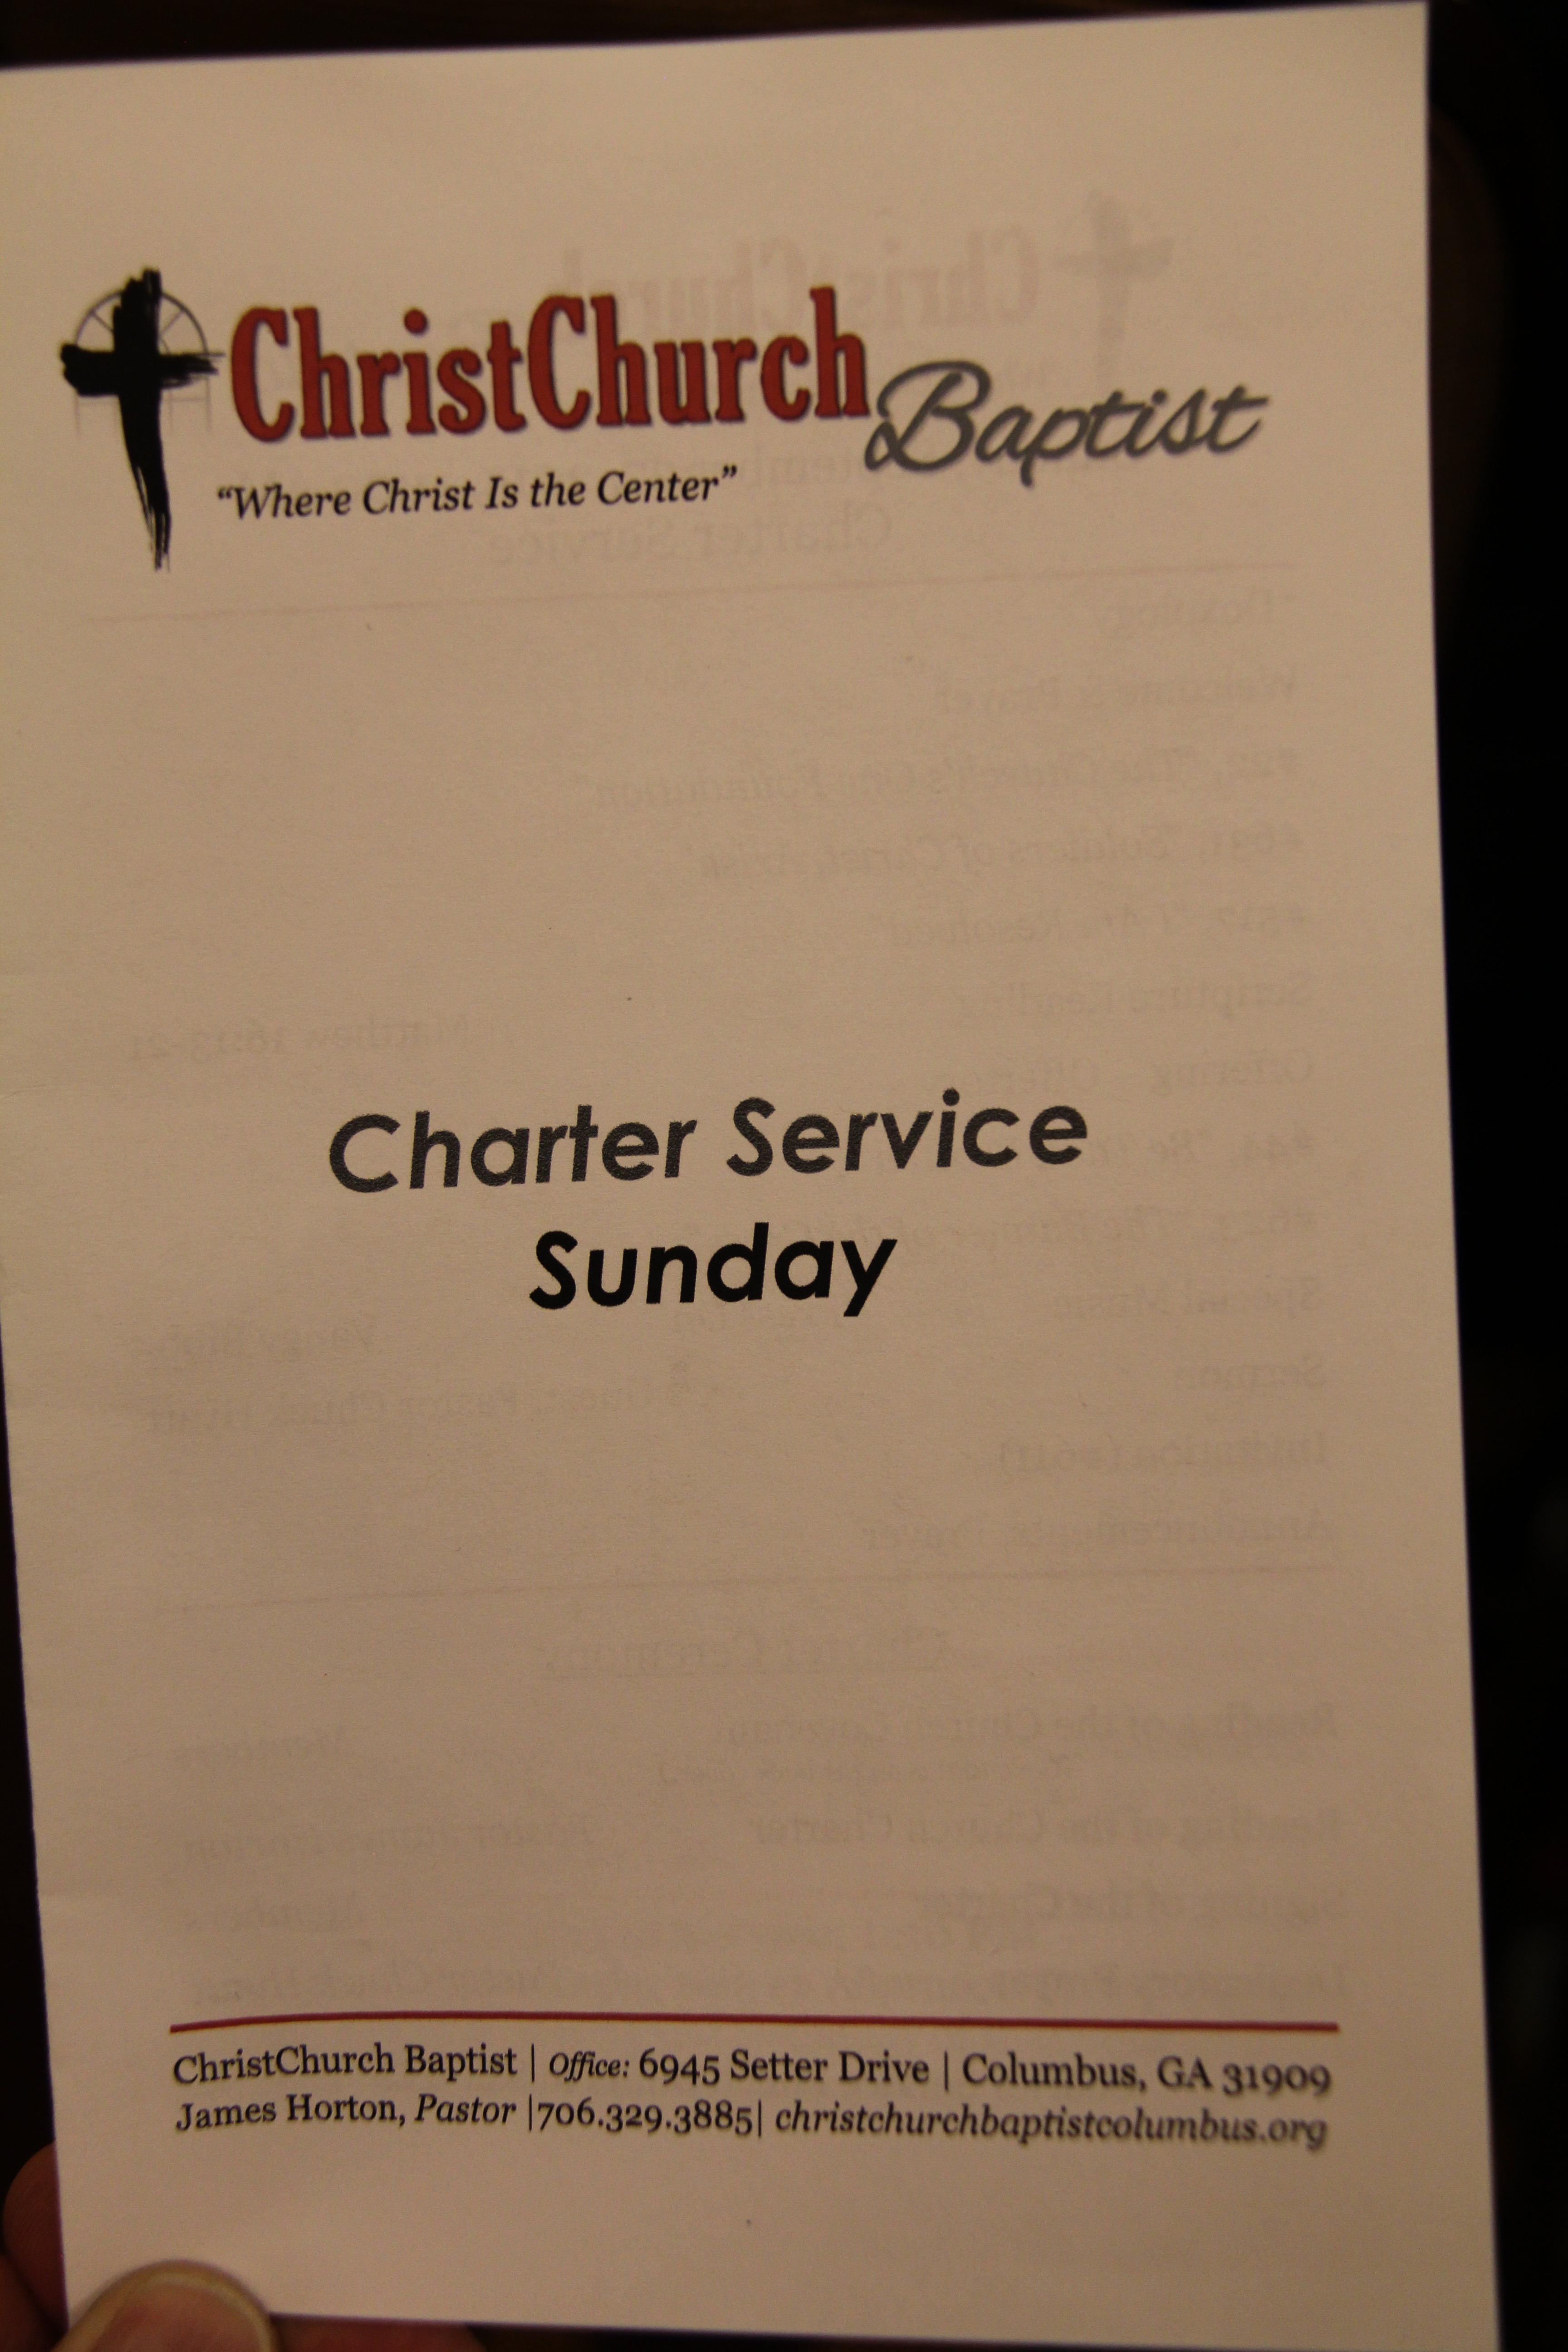 CCB_CharterService 005a.JPG